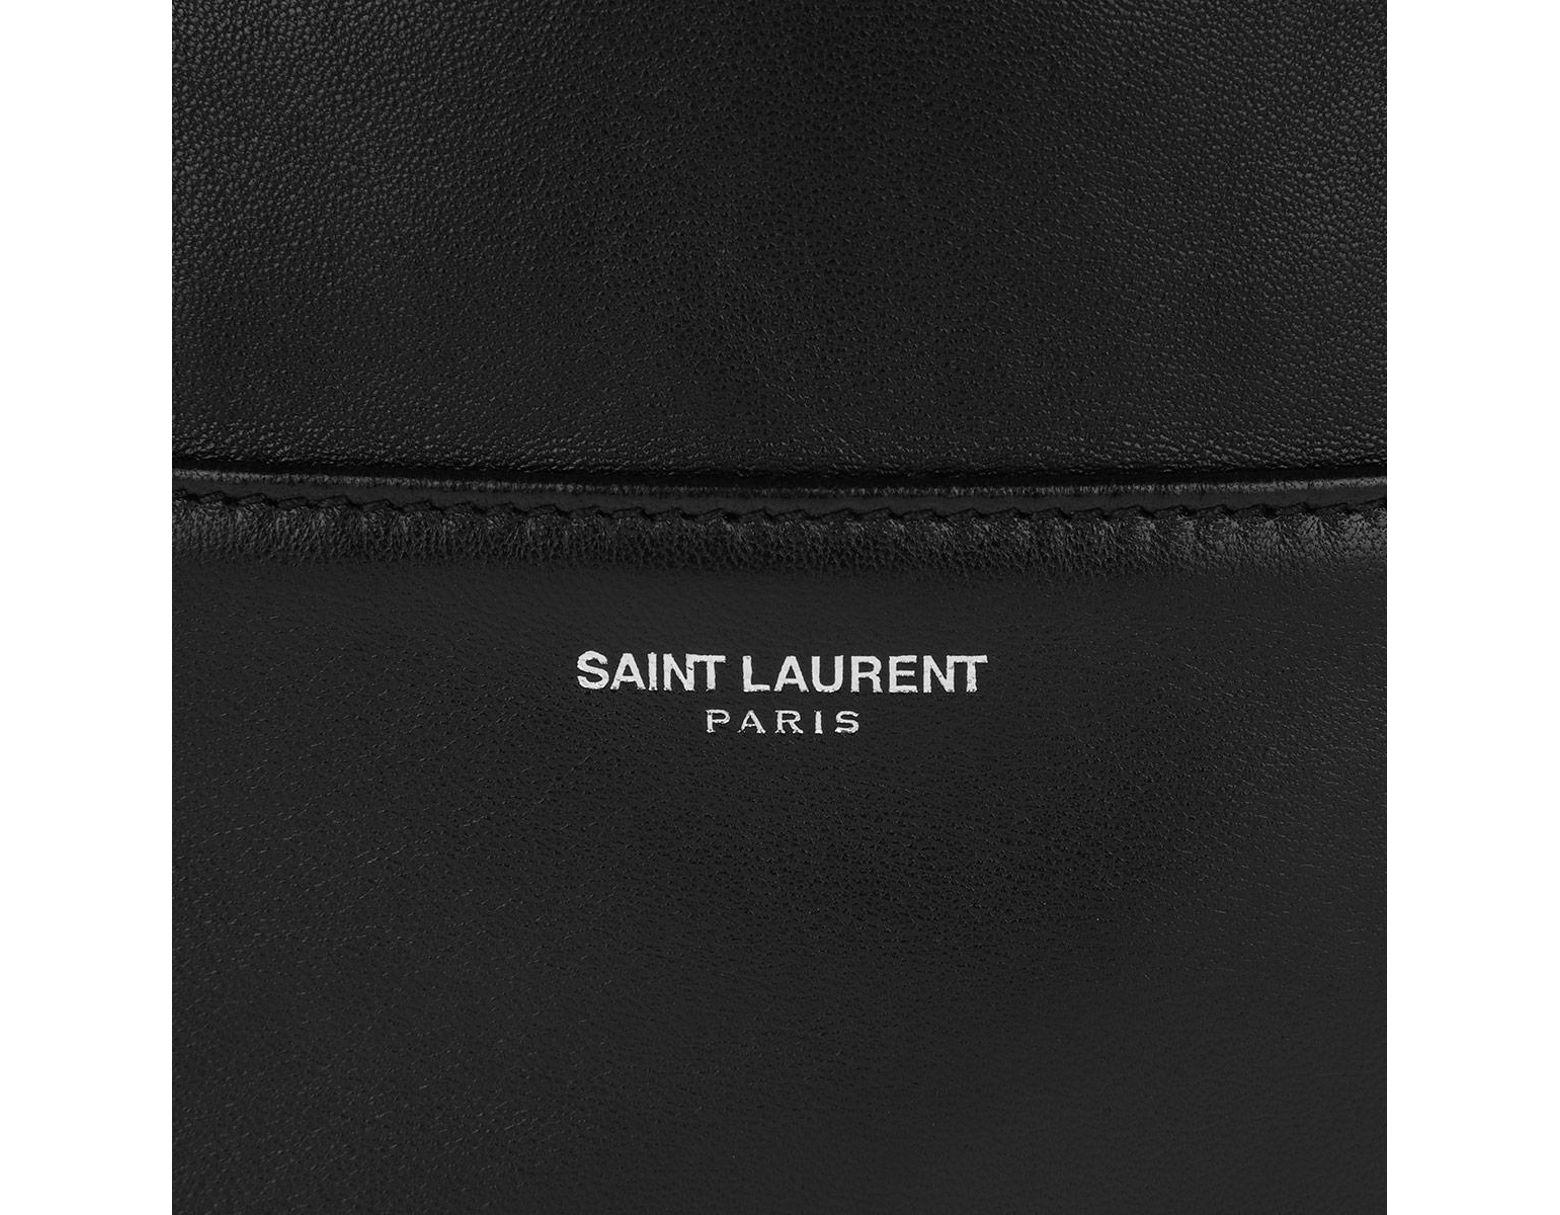 7f65824c5 Saint Laurent Harlem Shopping Bag Lambskin Black in Black - Save 1% - Lyst